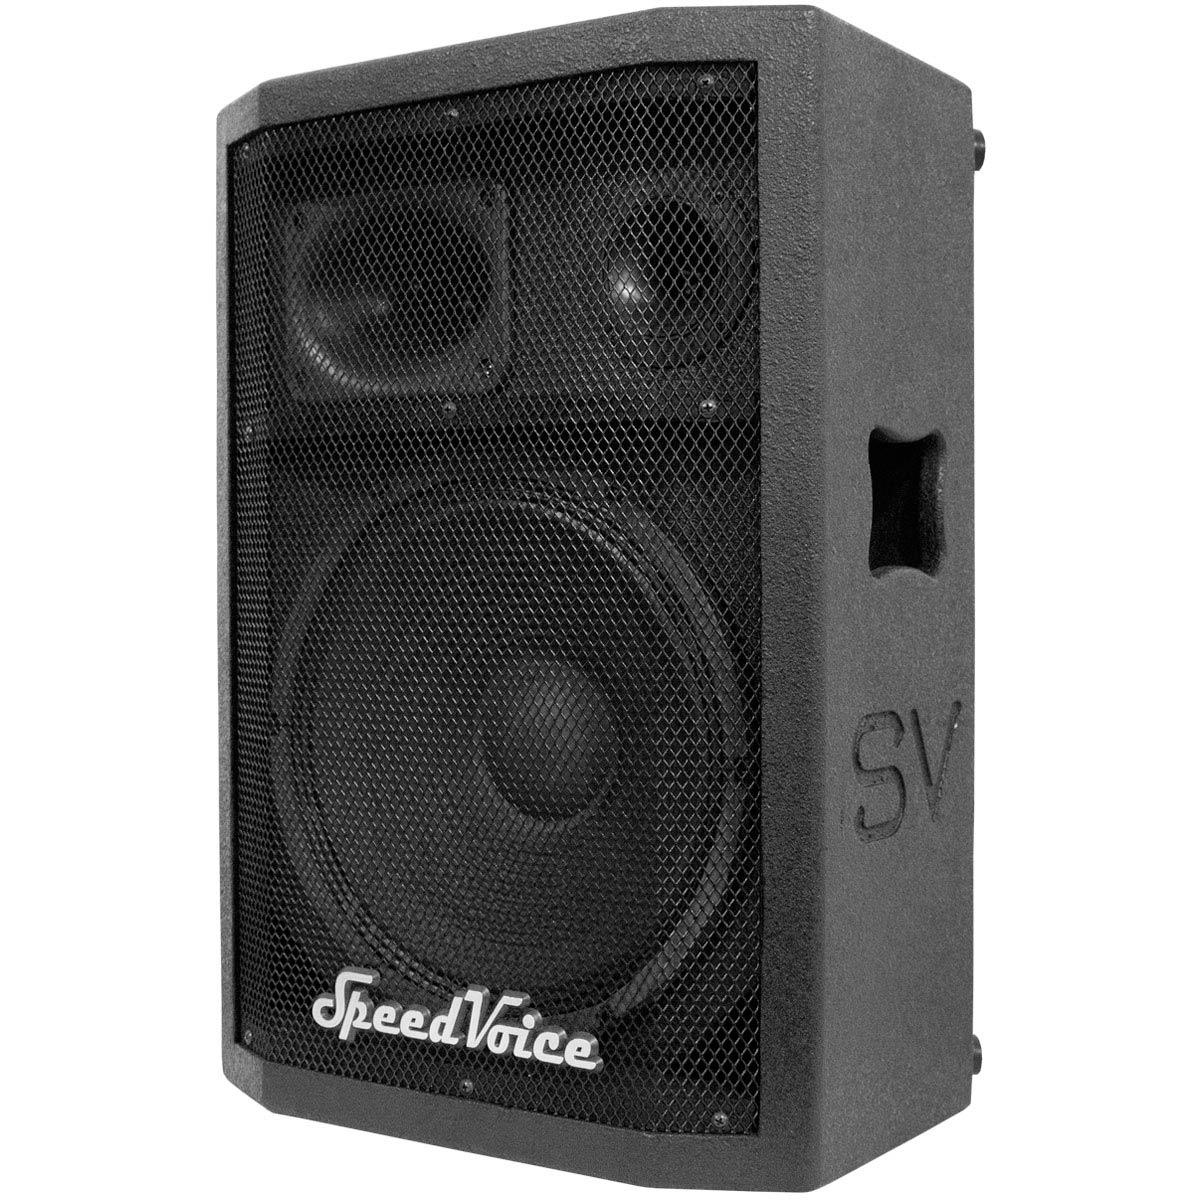 SVX15 - Caixa Passiva 200W SVX 15 - Speed Voice